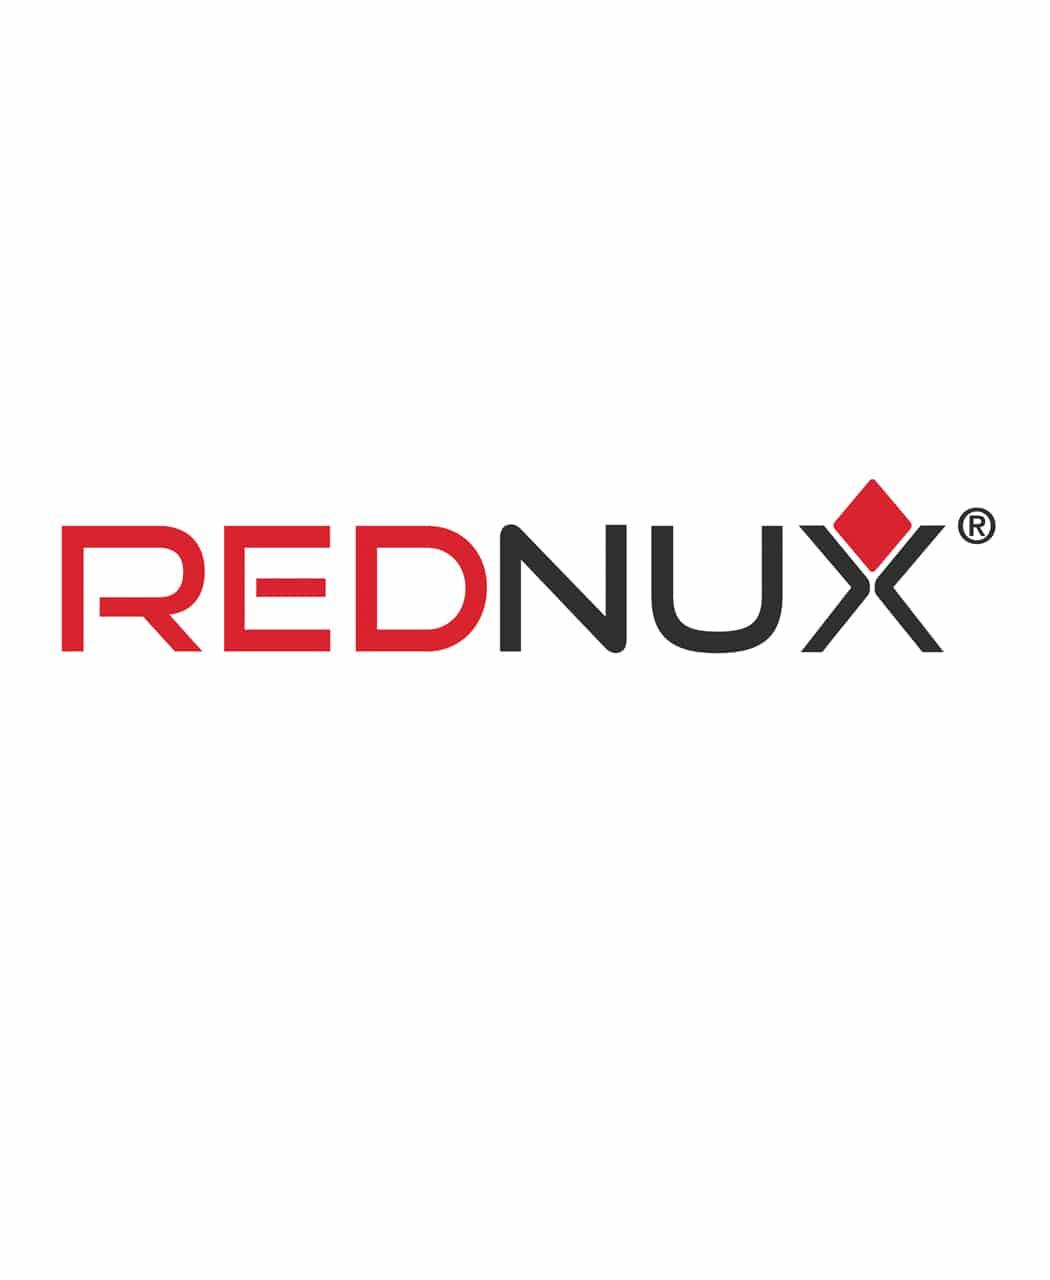 REDNUX-LOGO